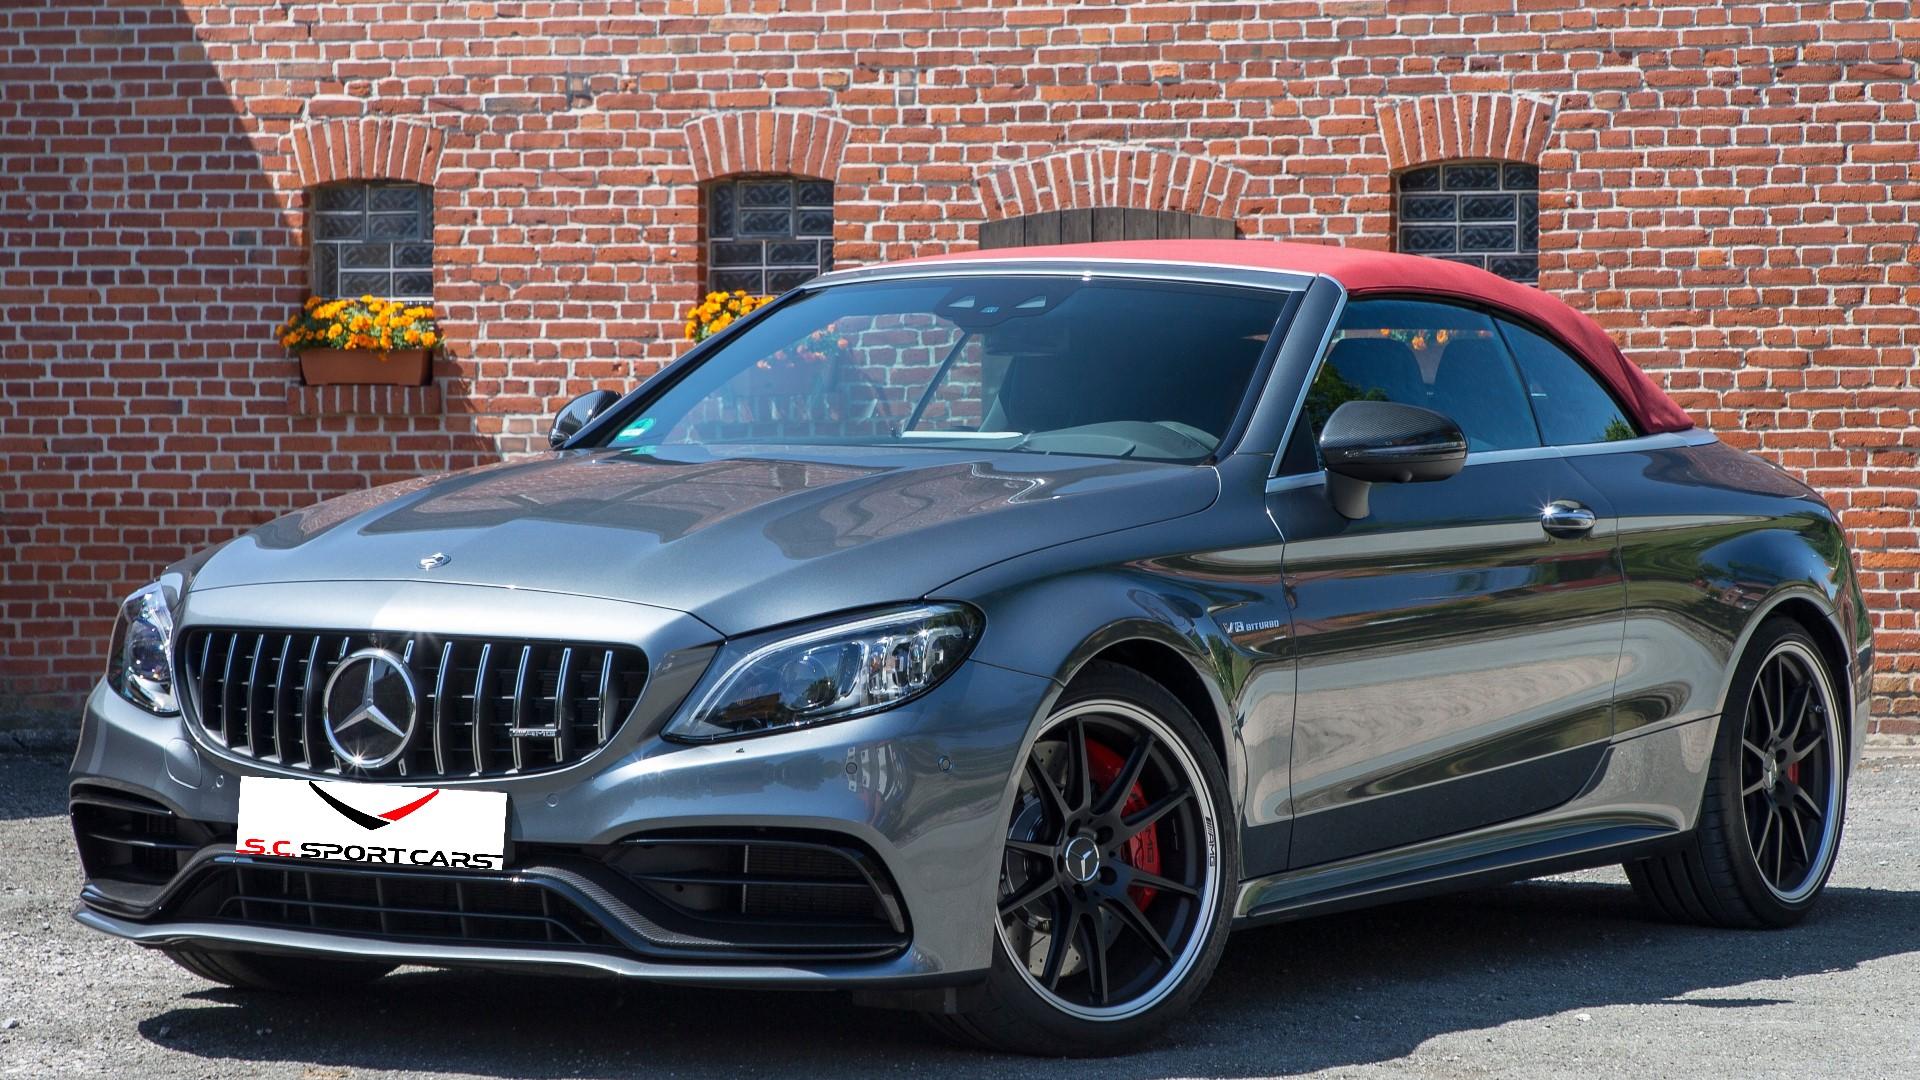 SC Sport Cars Your sport car provider Mercedes AMG GT R